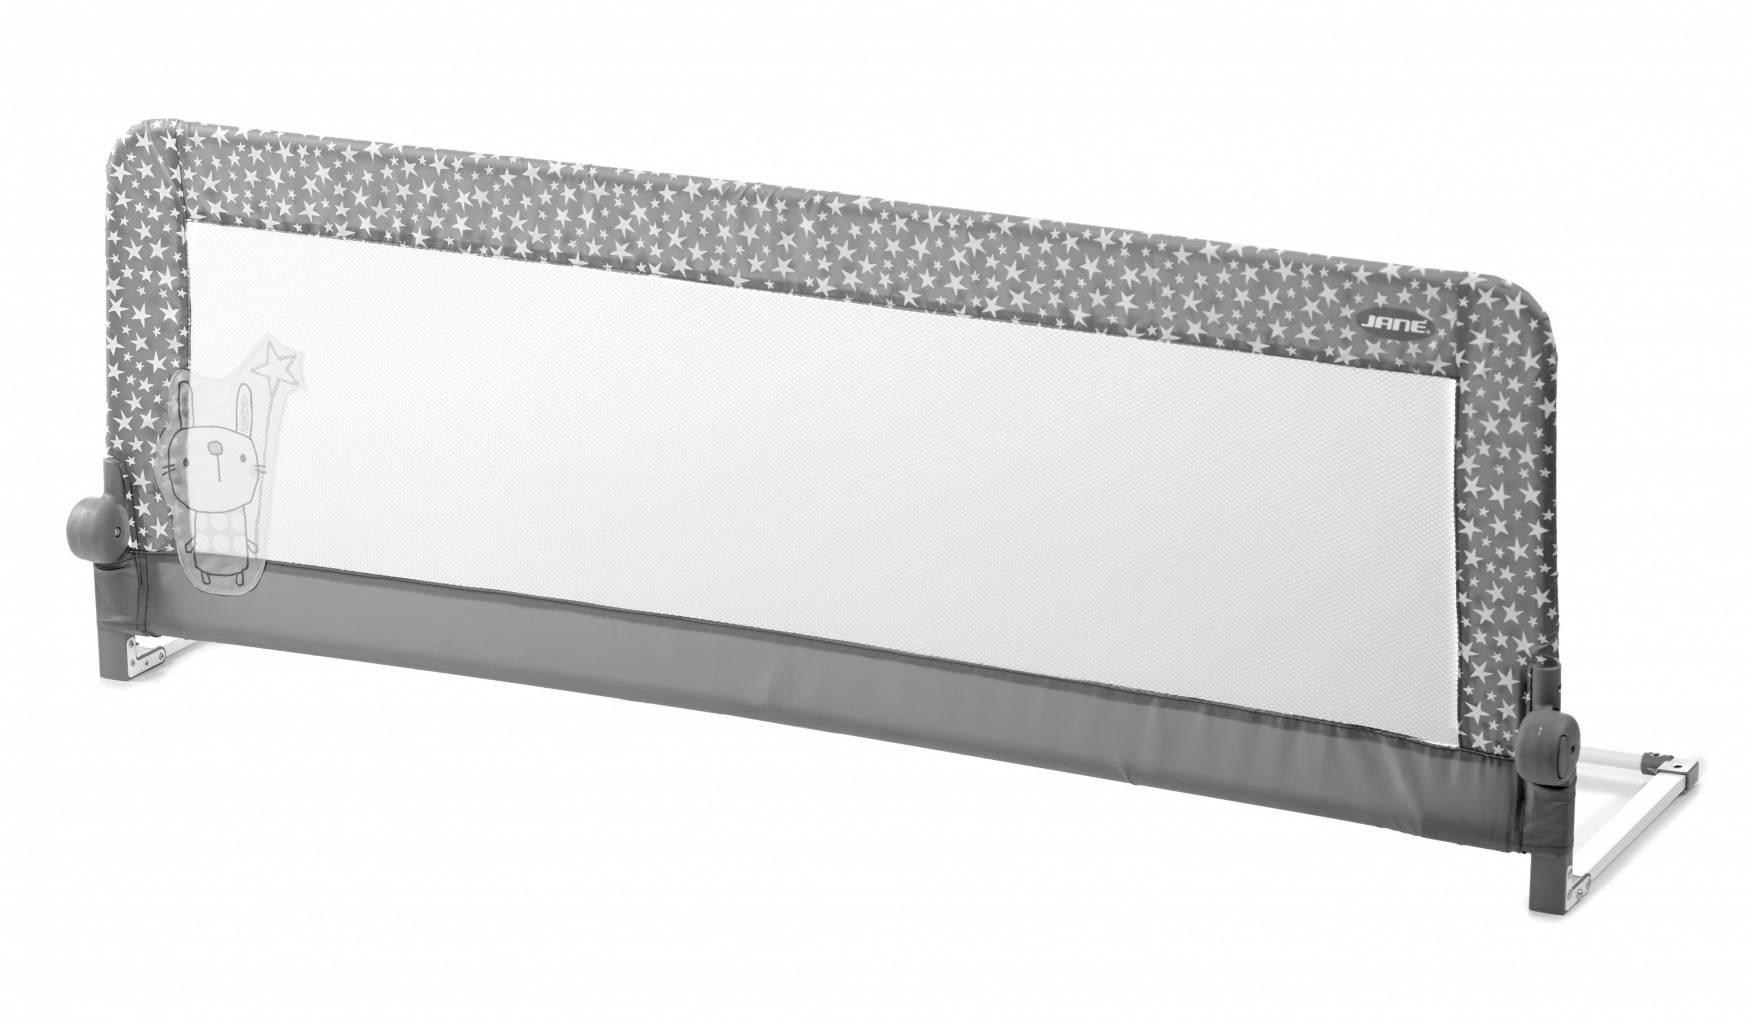 Barrera para cama compacta 150cm